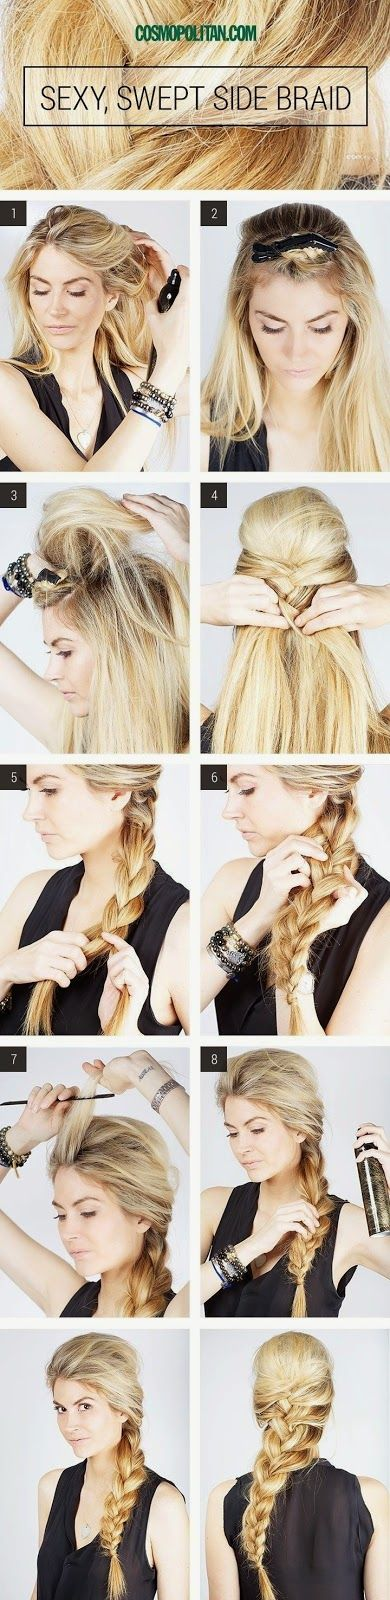 27 Cara Menata Rambut Panjang Yang Gampang Dan Susah ~ Sealkazz Blog